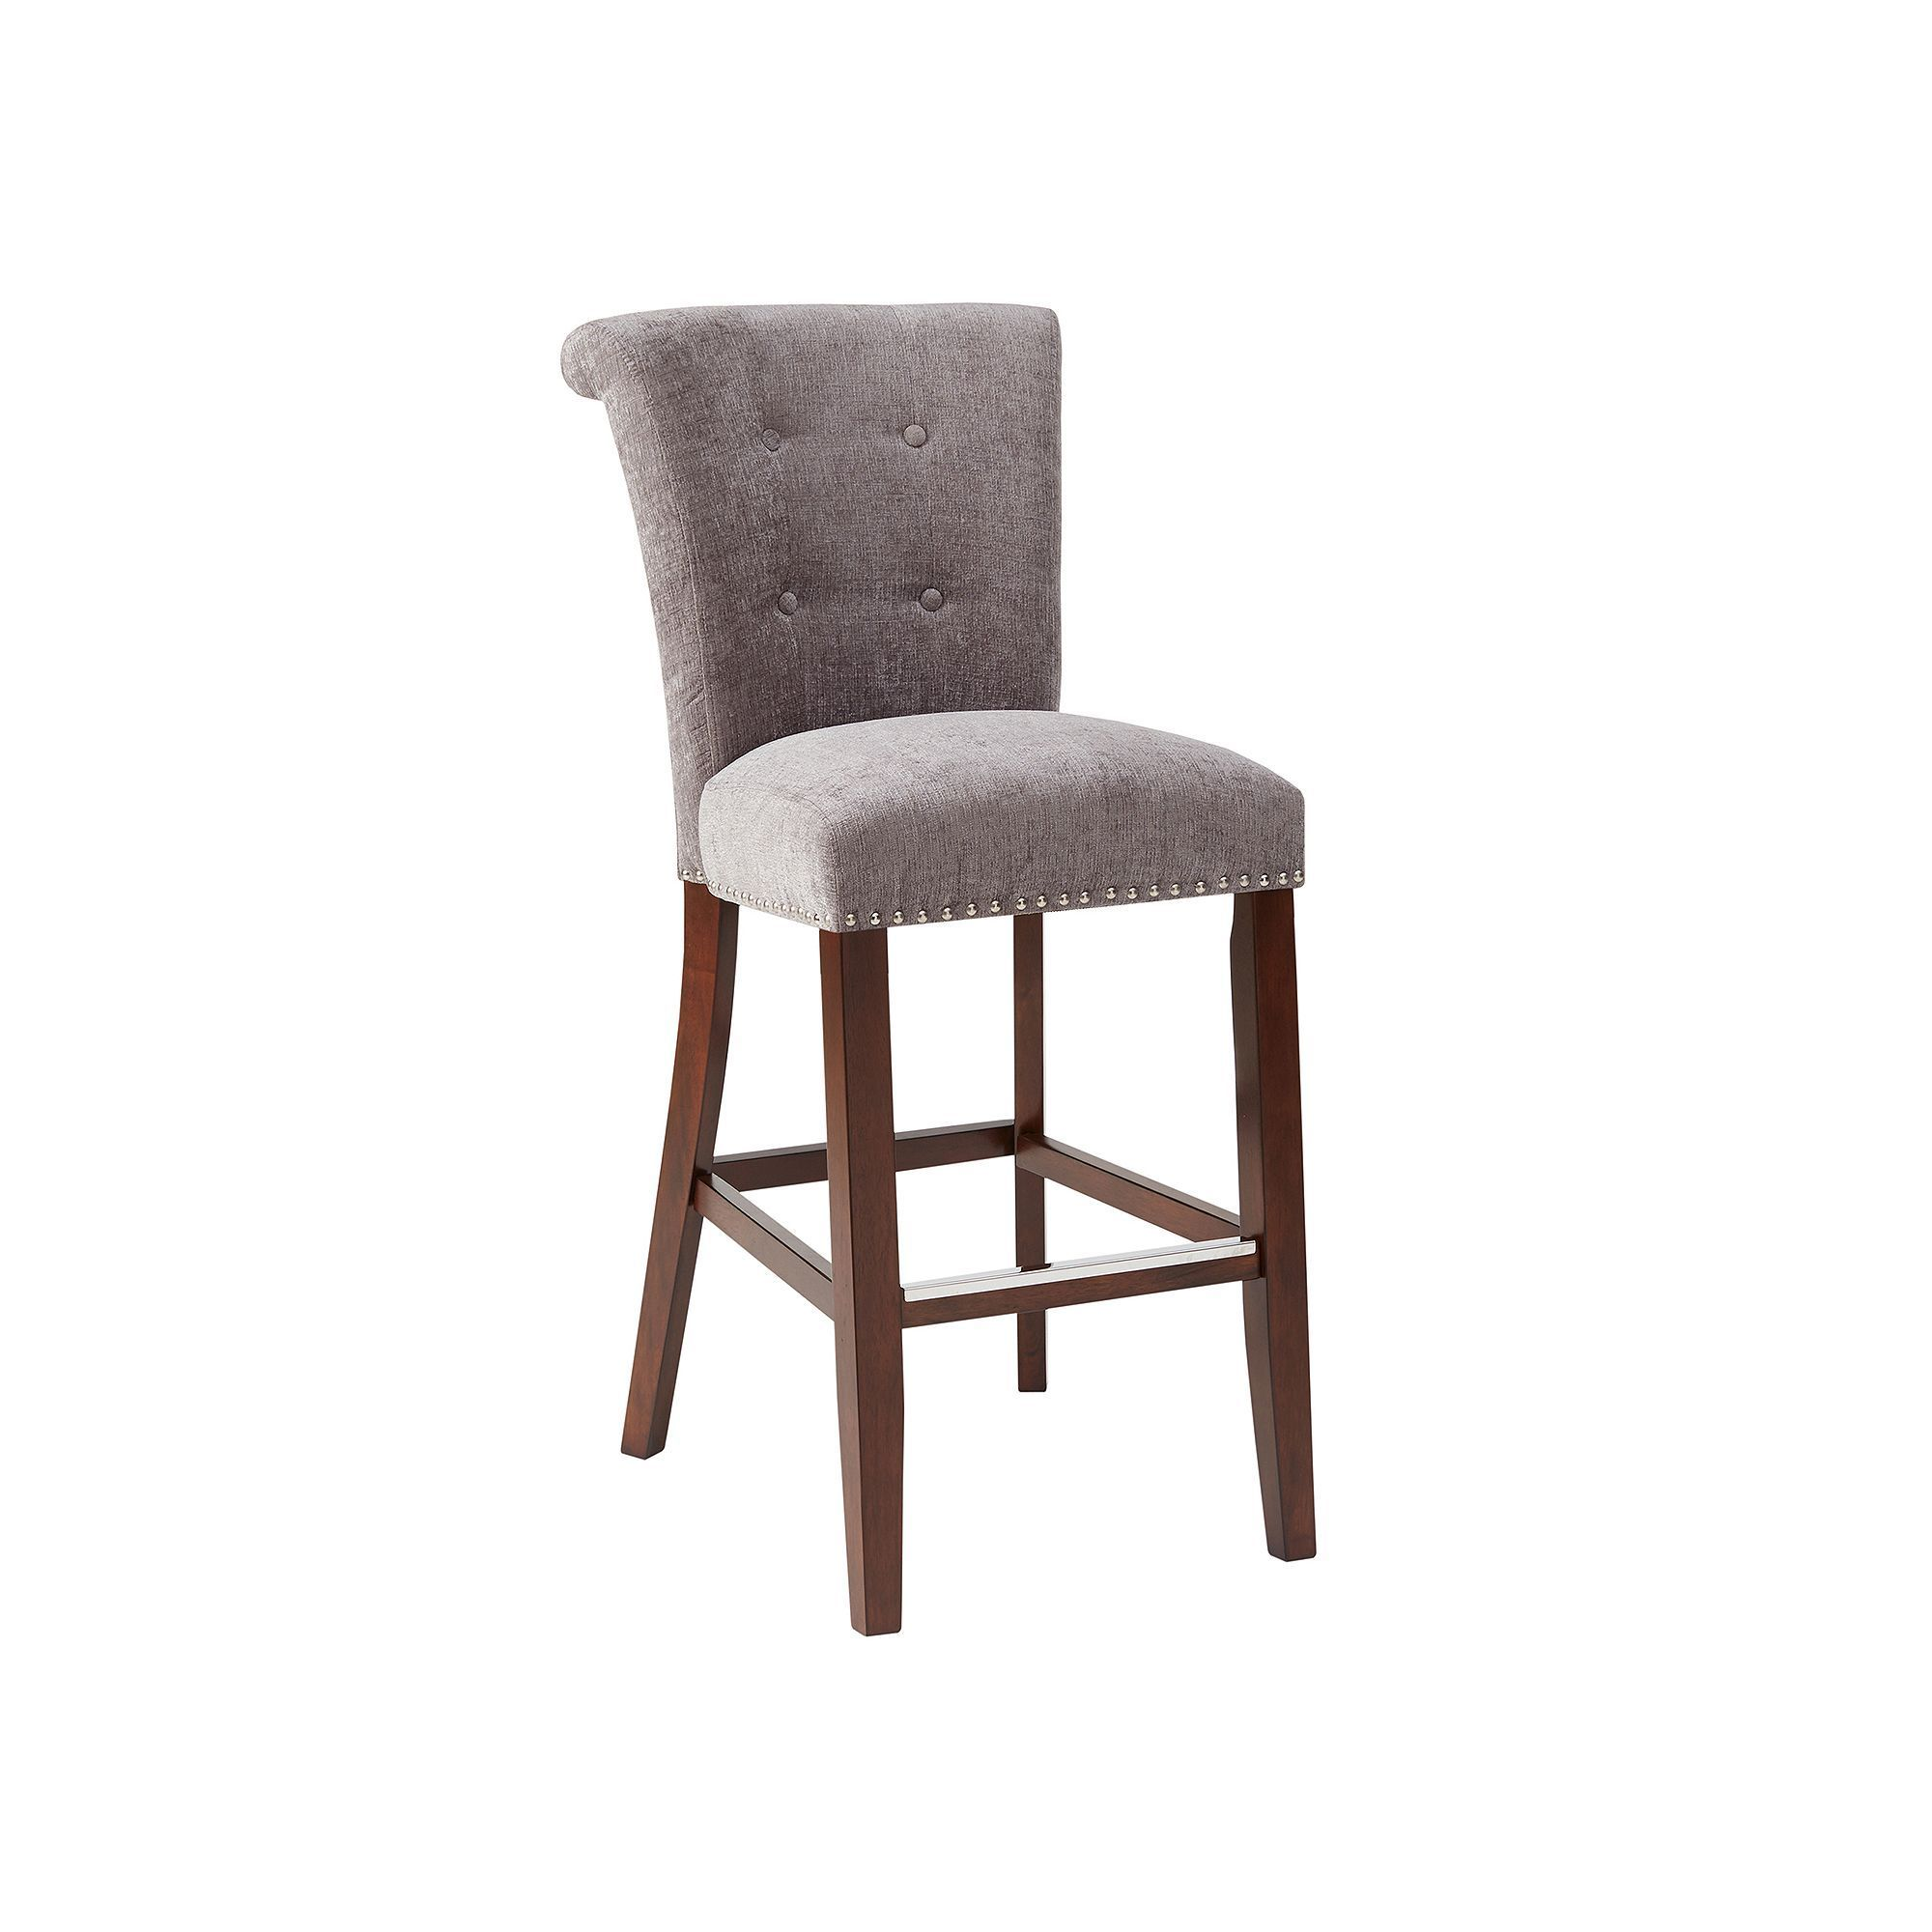 Astonishing 30 Inch Bar Stool With Back Avalonit Net Frankydiablos Diy Chair Ideas Frankydiabloscom